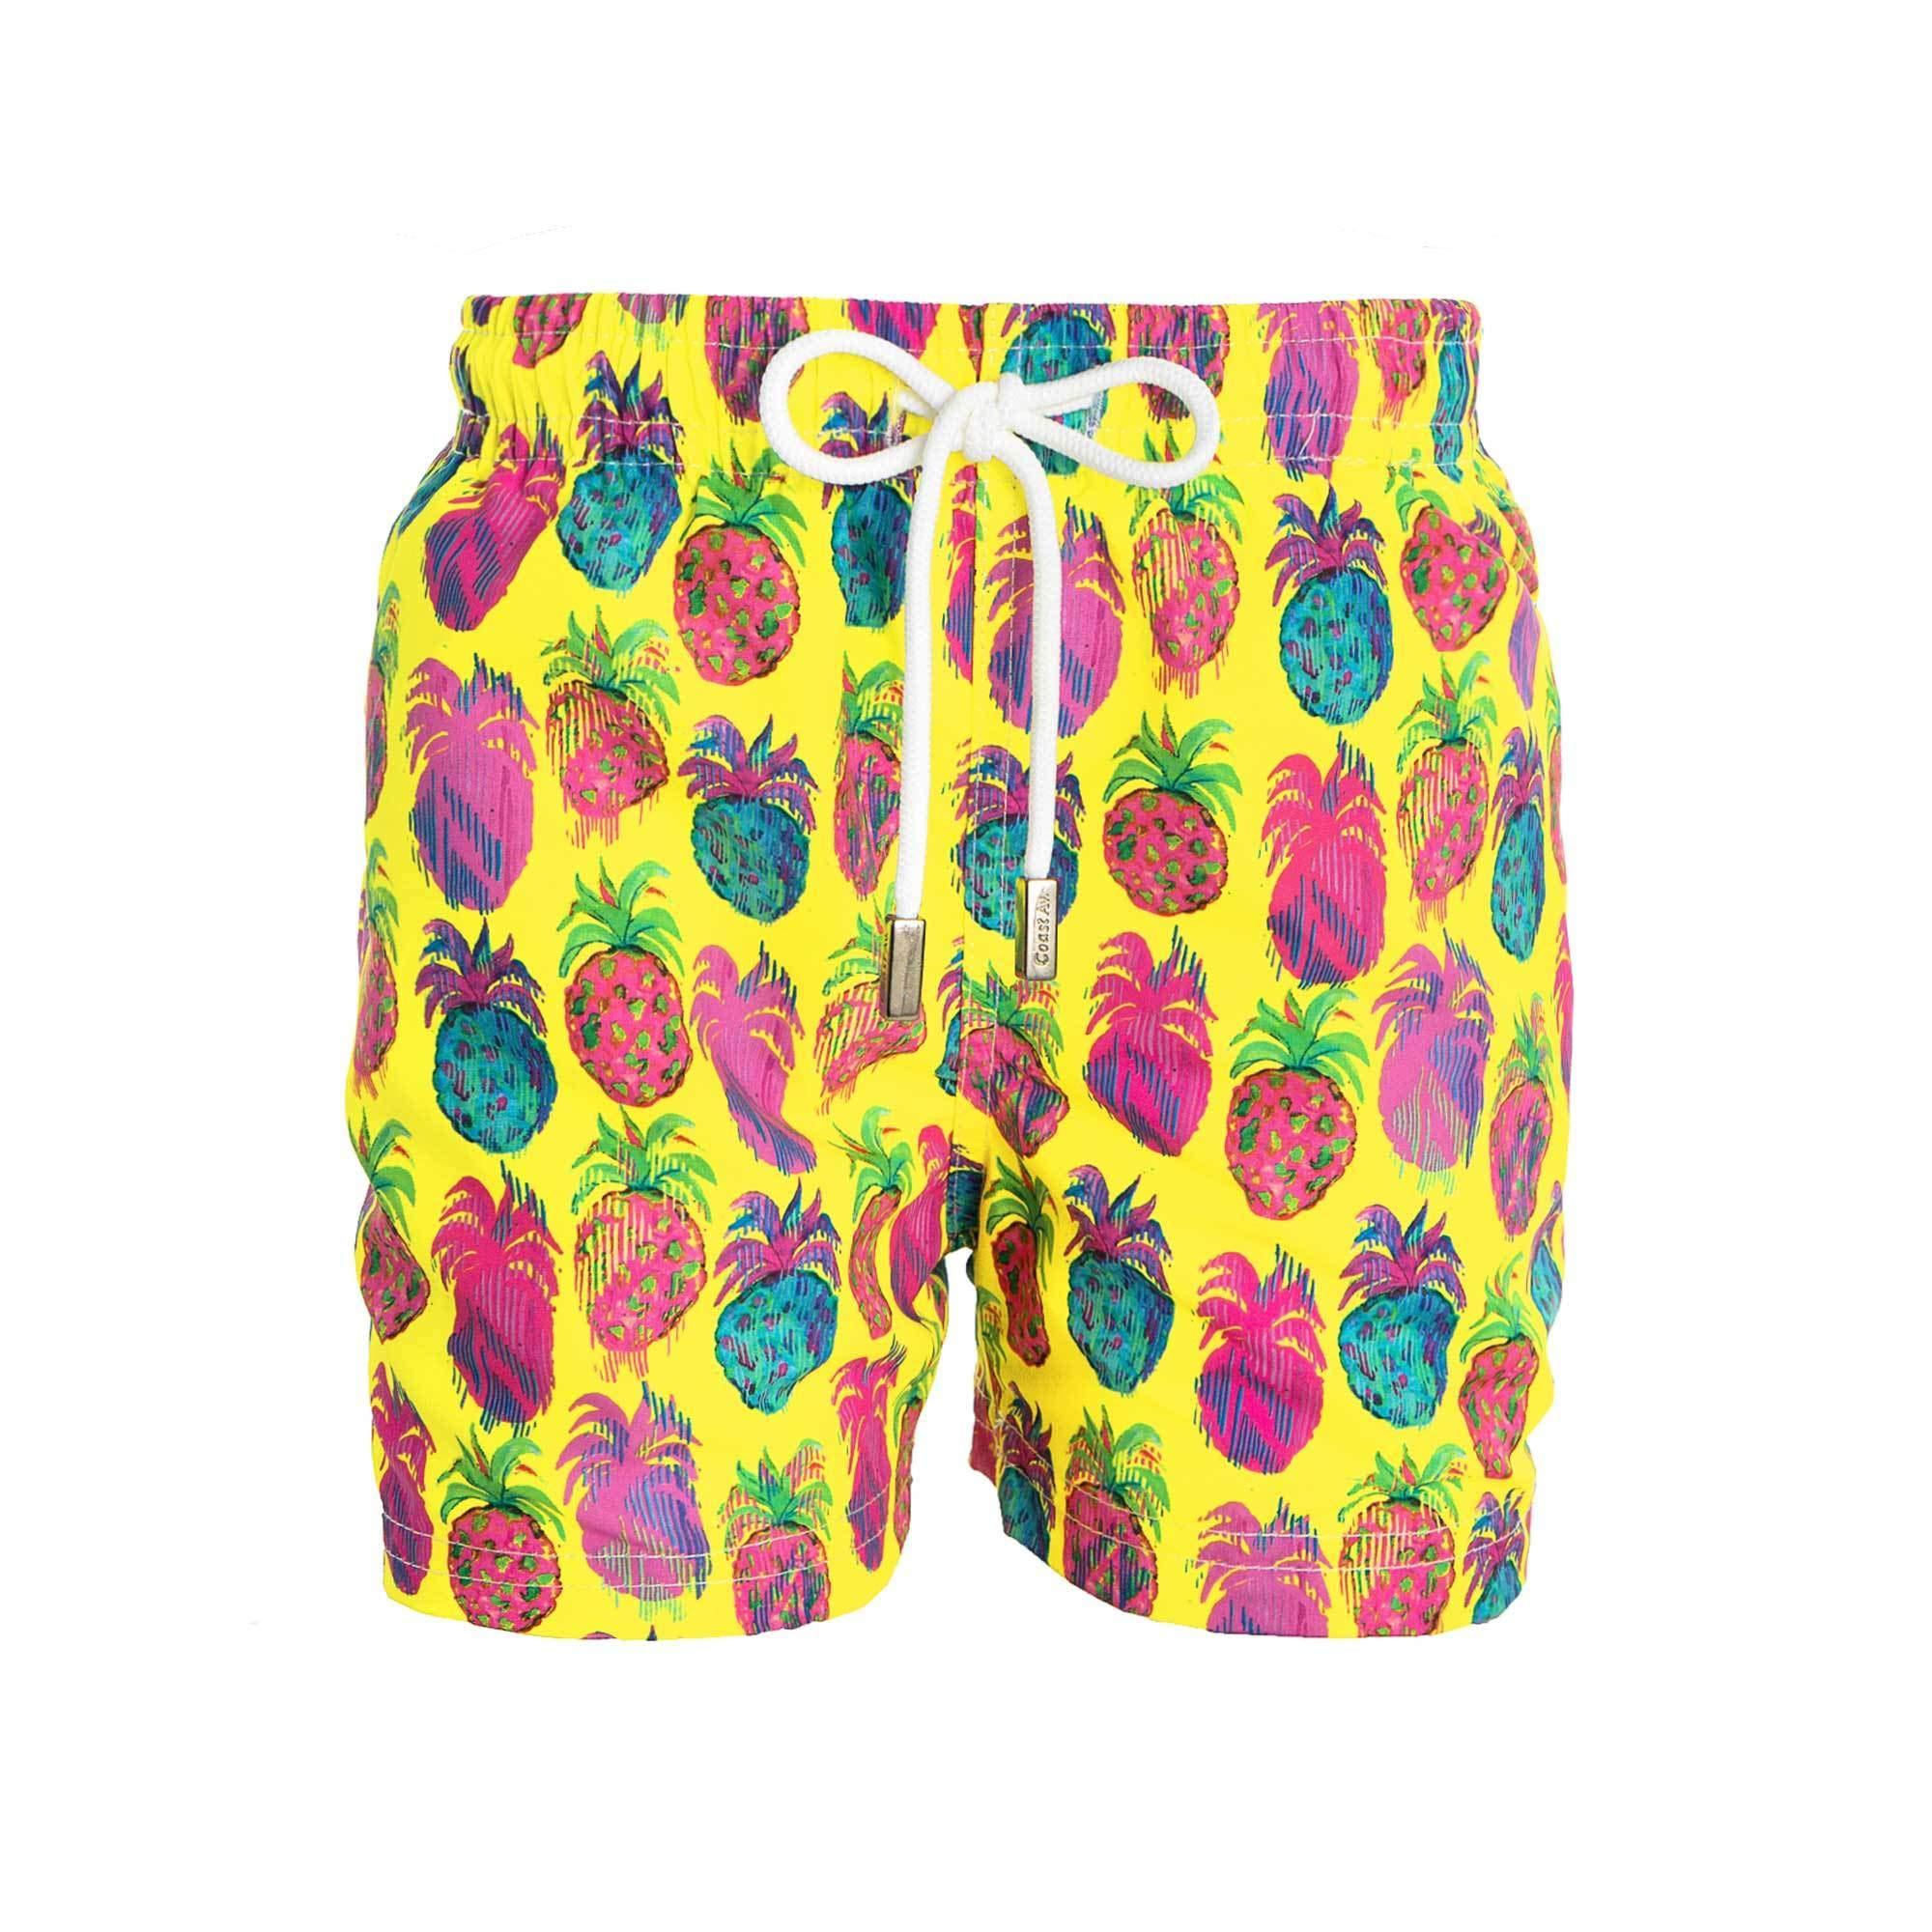 98 Coast Av. Colorful Print Collection Kids Boys' Premium Swimsuit Quick Dry Beach Trunks (L, Pineapples)